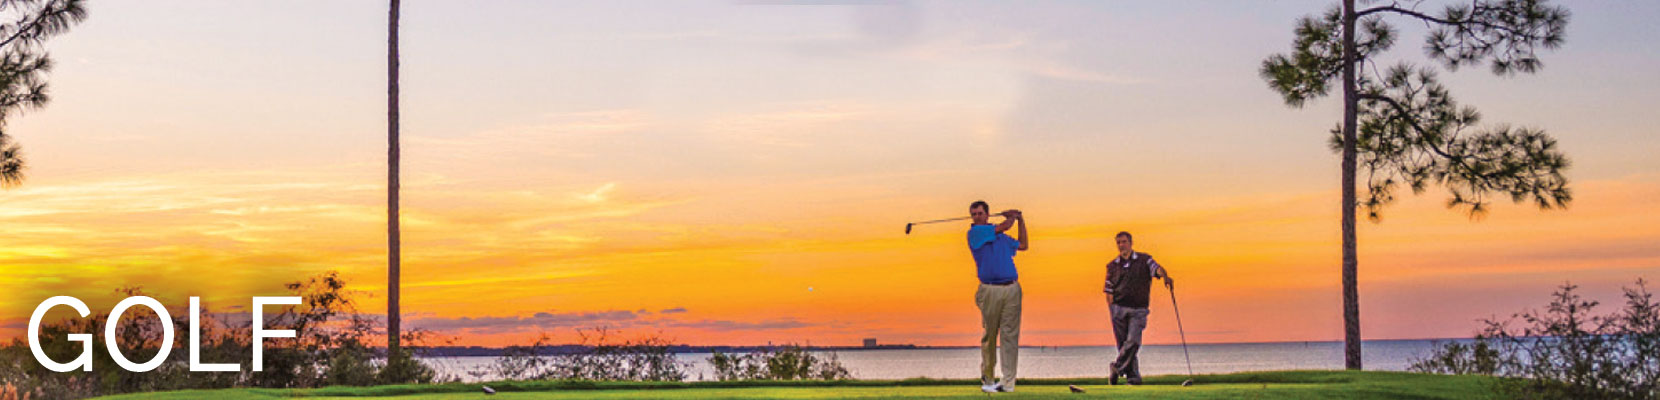 Destin golf courses near St. Kitts condo.